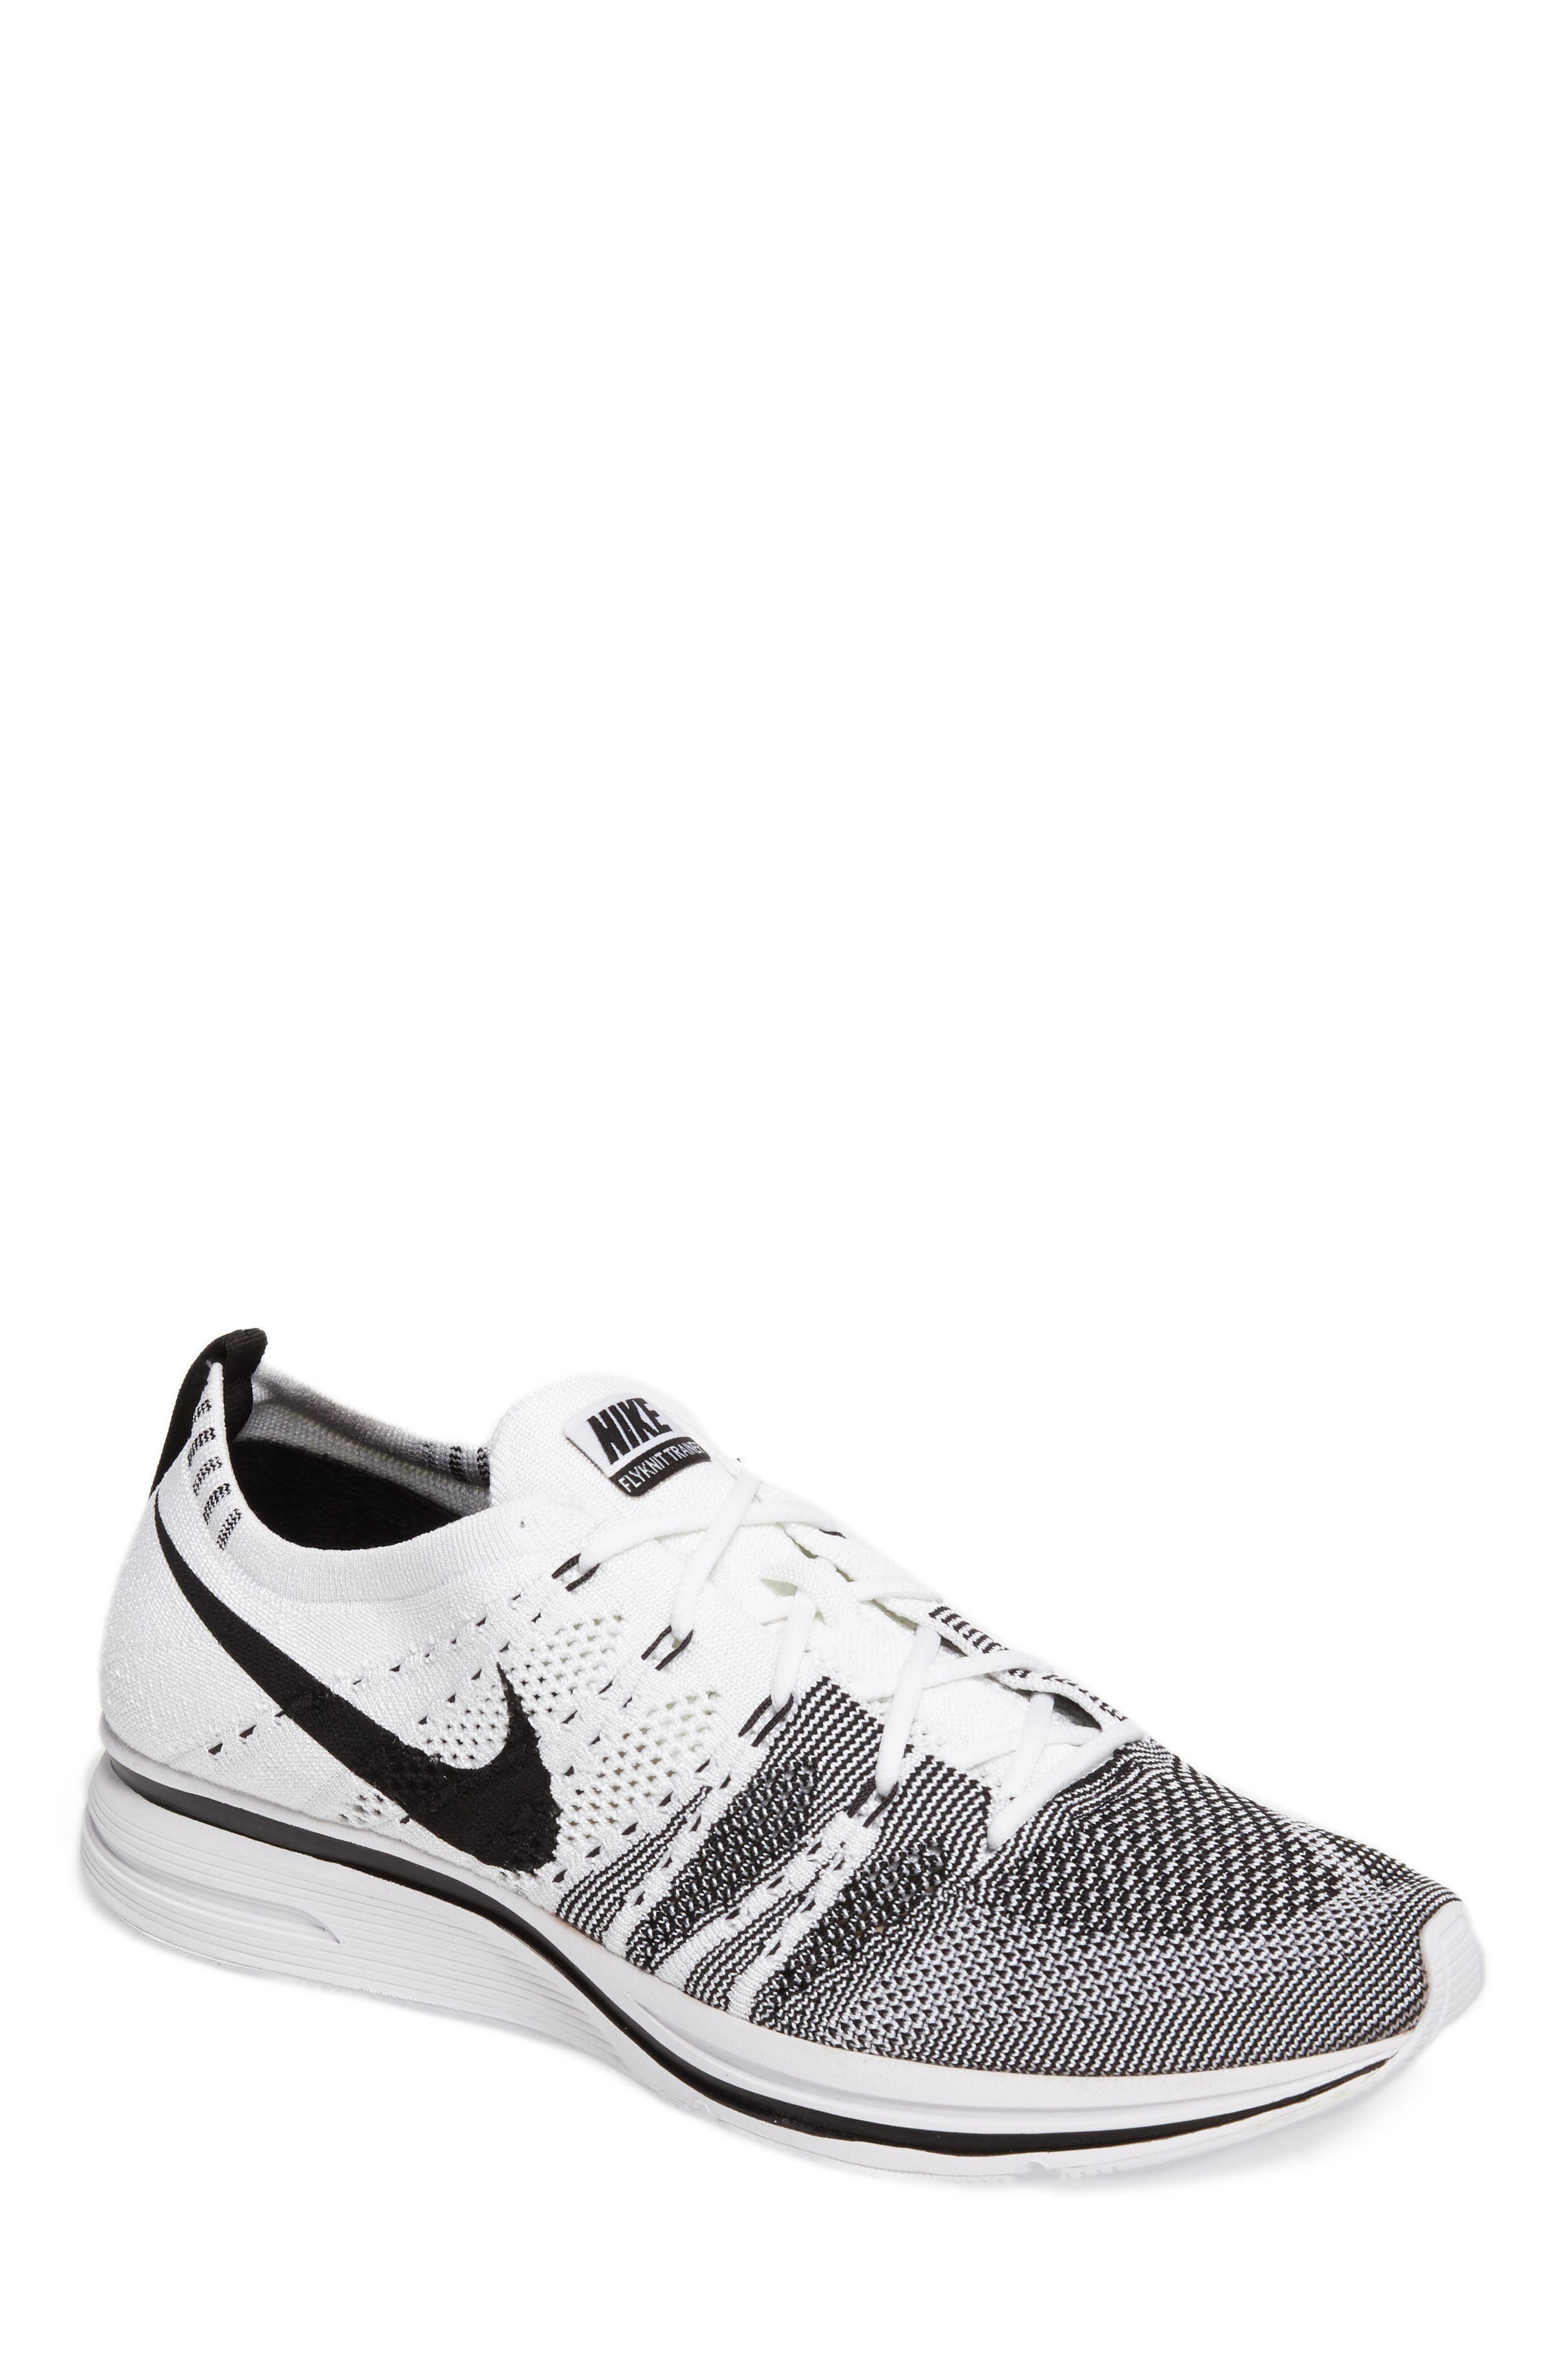 NikeLab Flyknit Trainer Sneaker,                             Main thumbnail 1, color,                             100